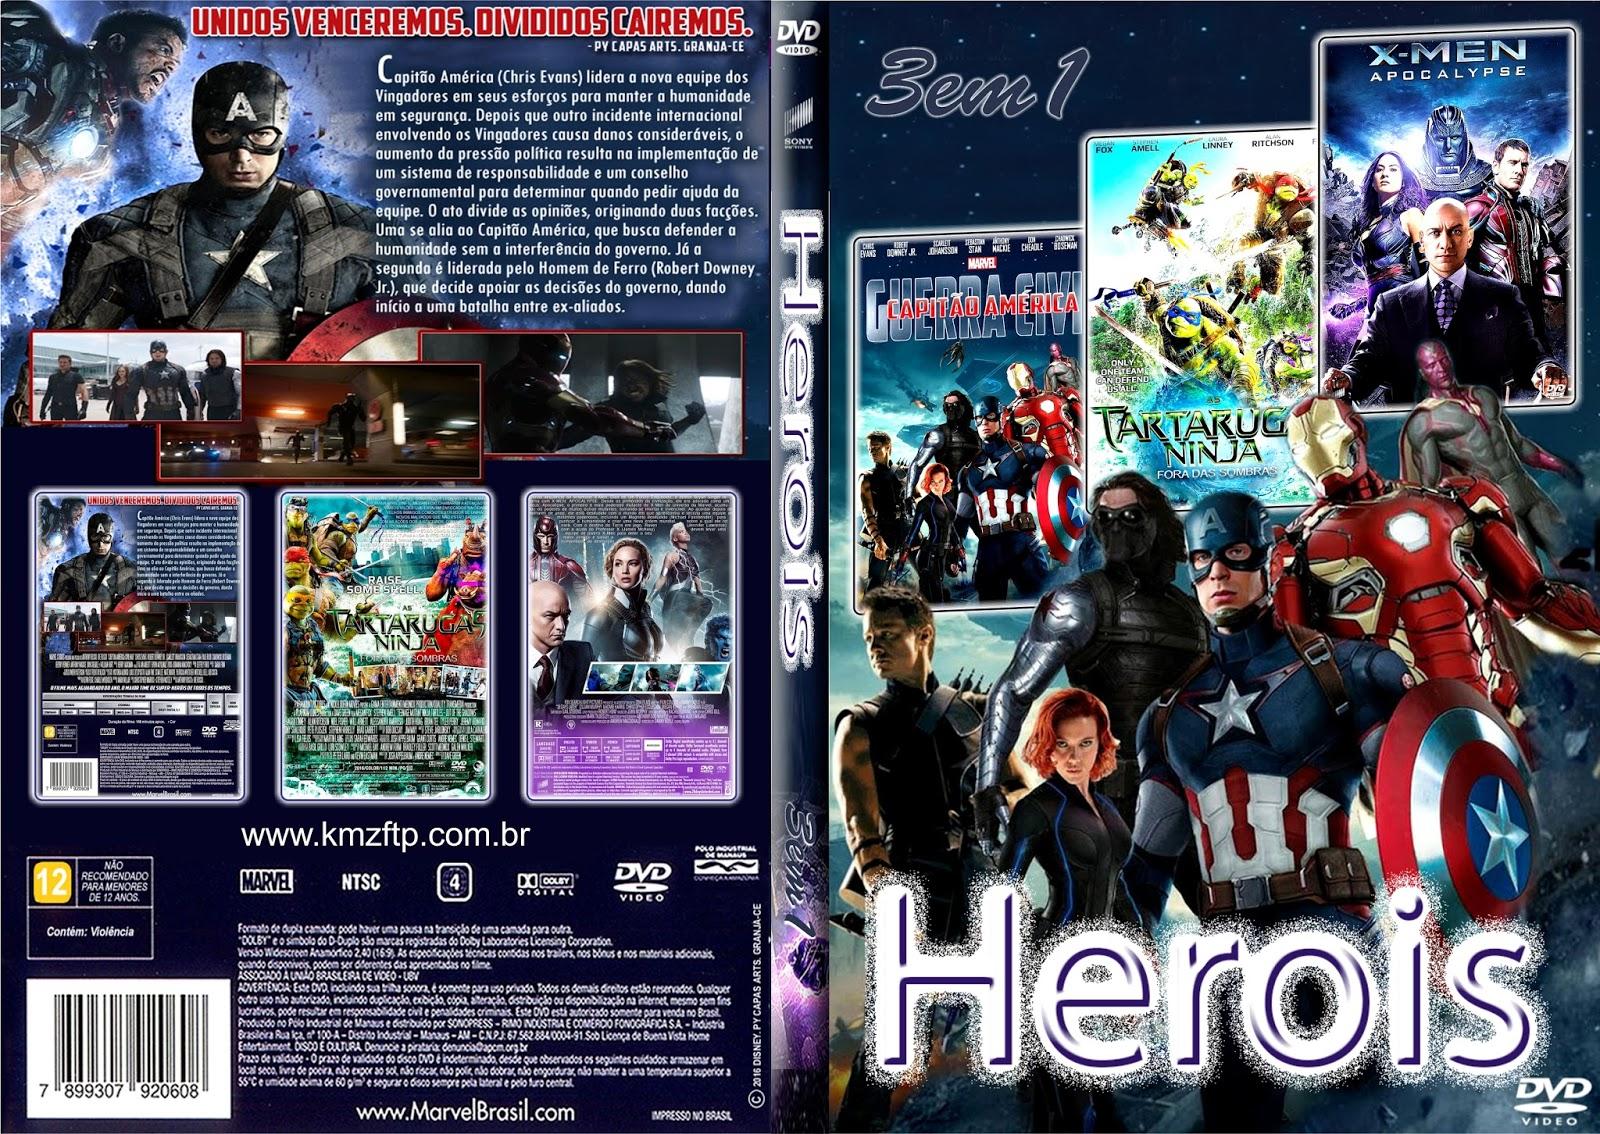 Download Heróis 3X1 DVD-R Download Heróis 3X1 DVD-R herois 3em1 www